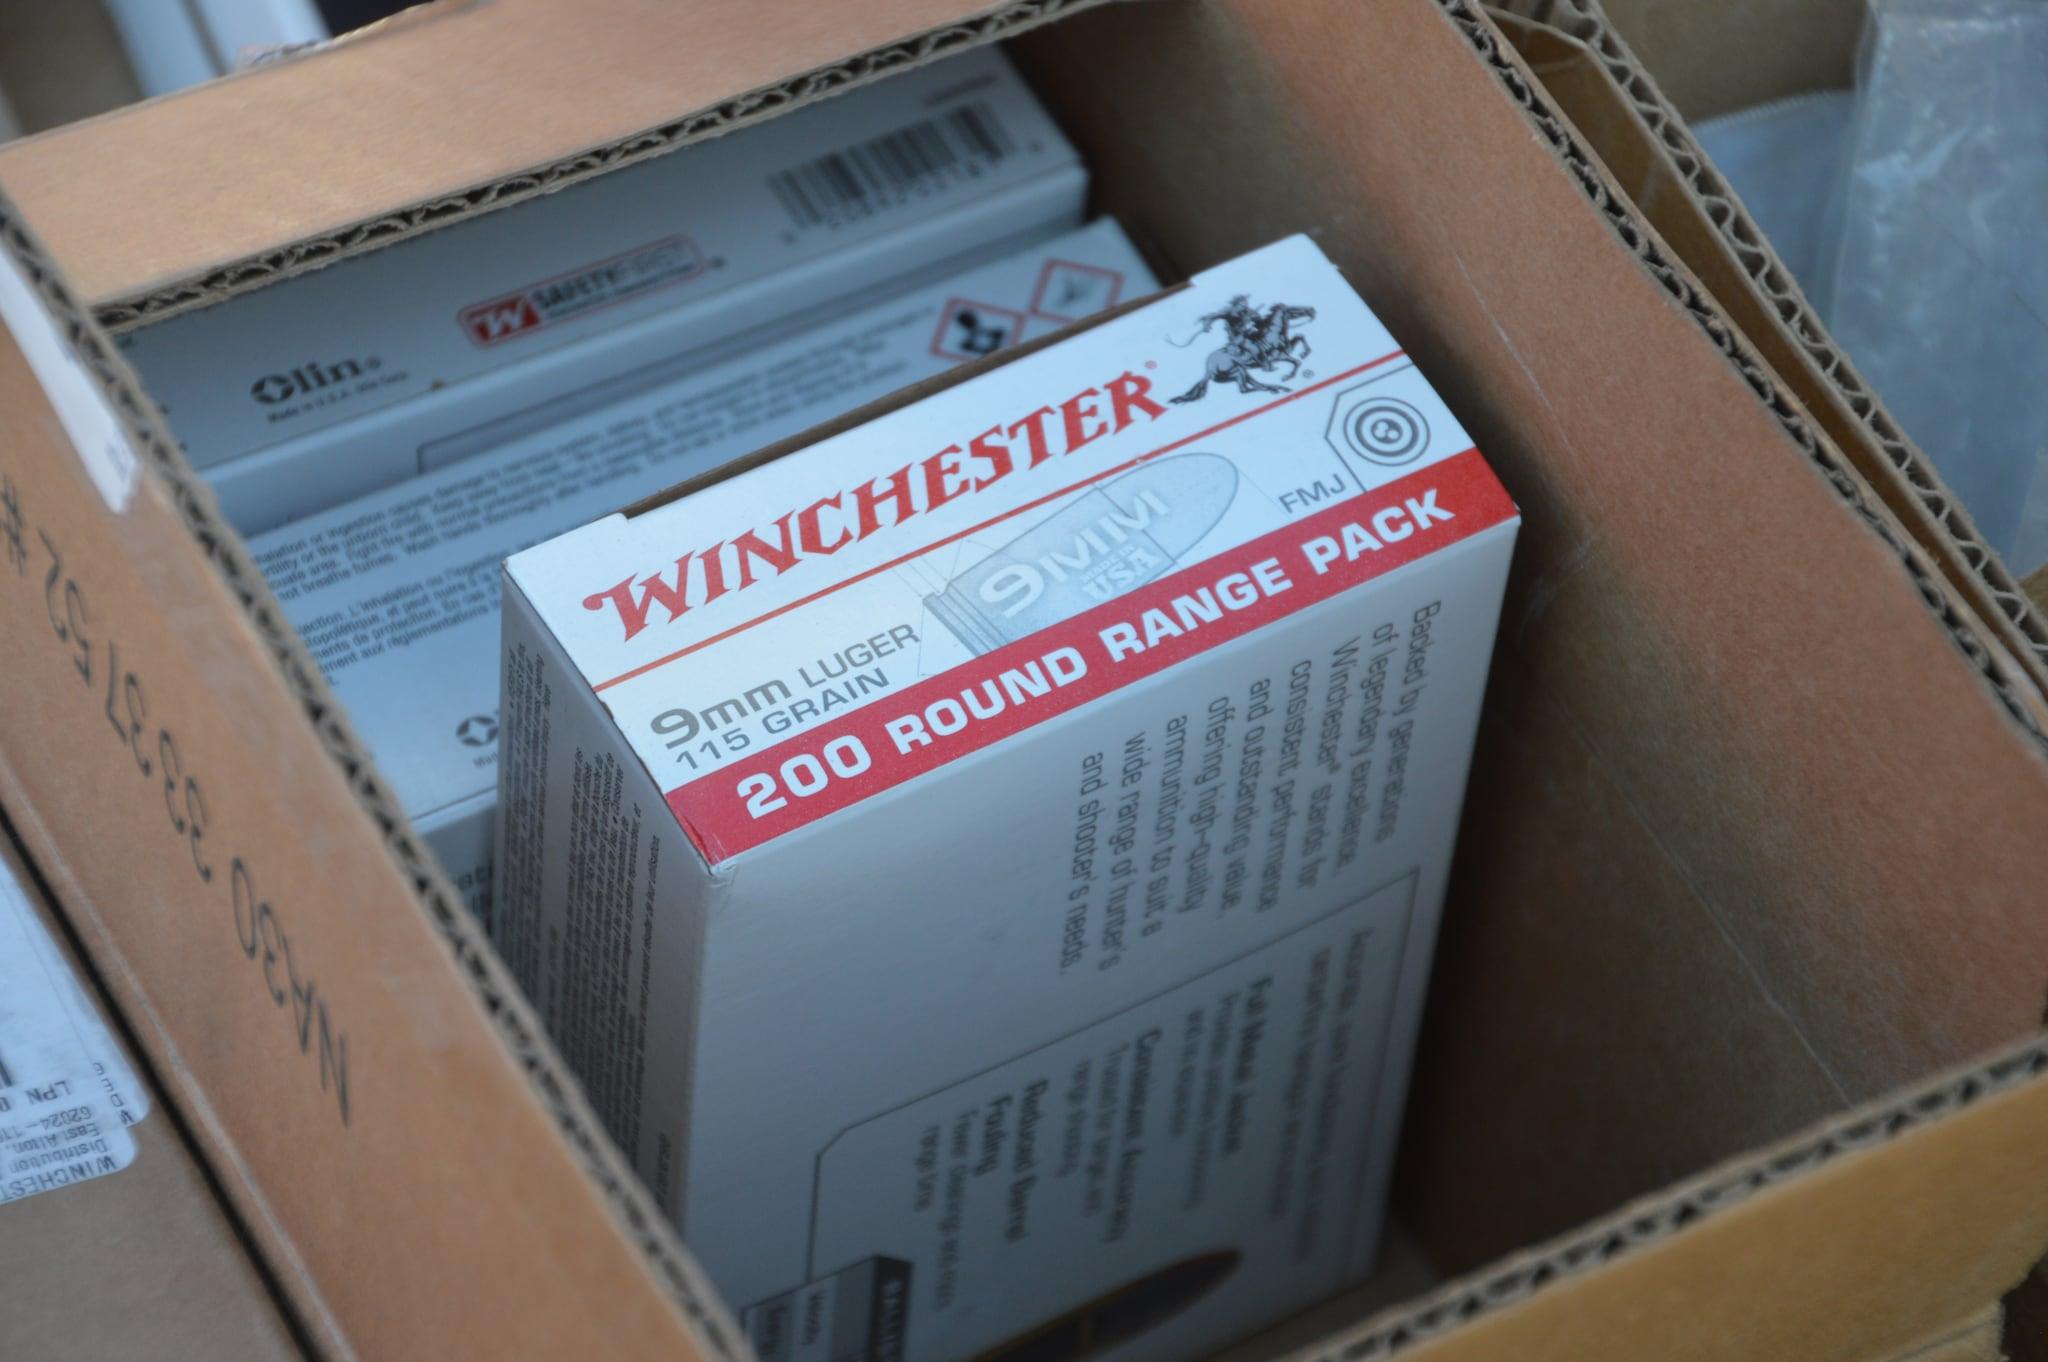 Range pack, you say? (Photo: Chris Eger/Guns.com)